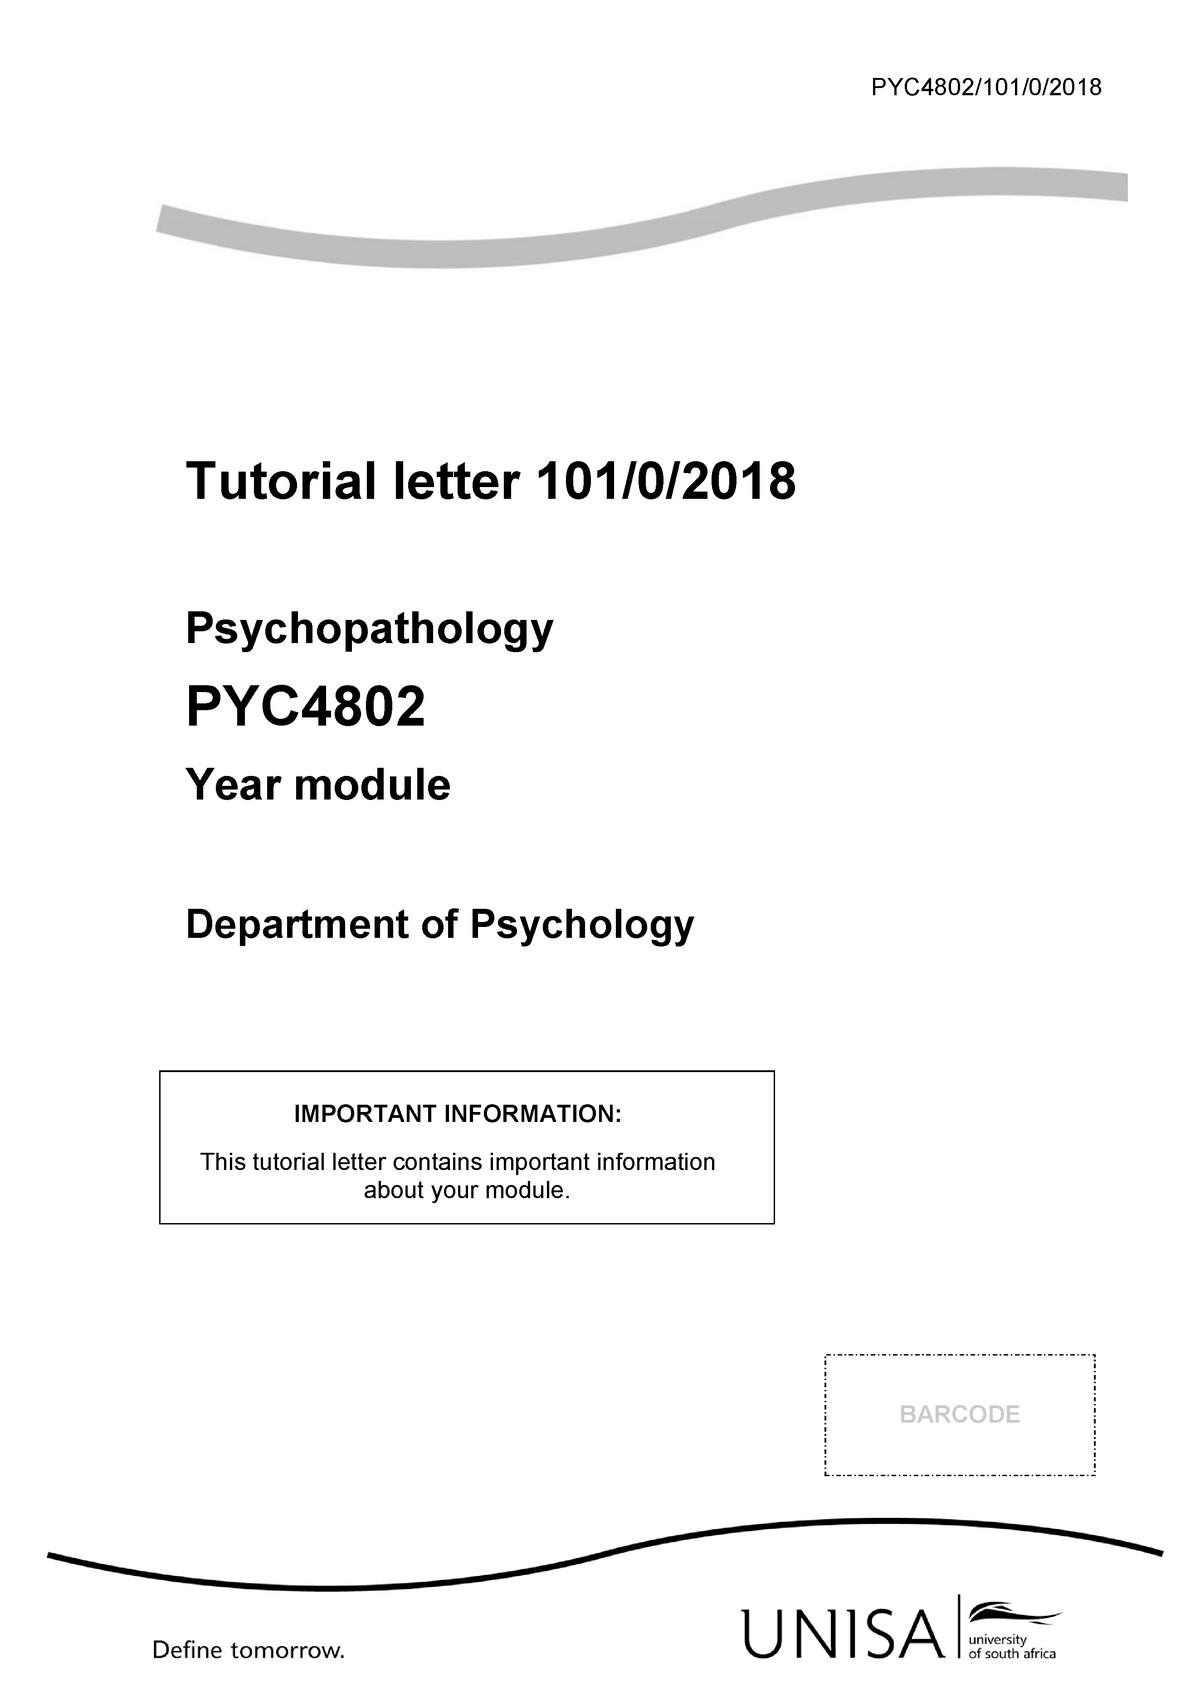 101 2018 0 b - TUTORIAL LETTER - PYC4802: Psychopathology - StuDocu